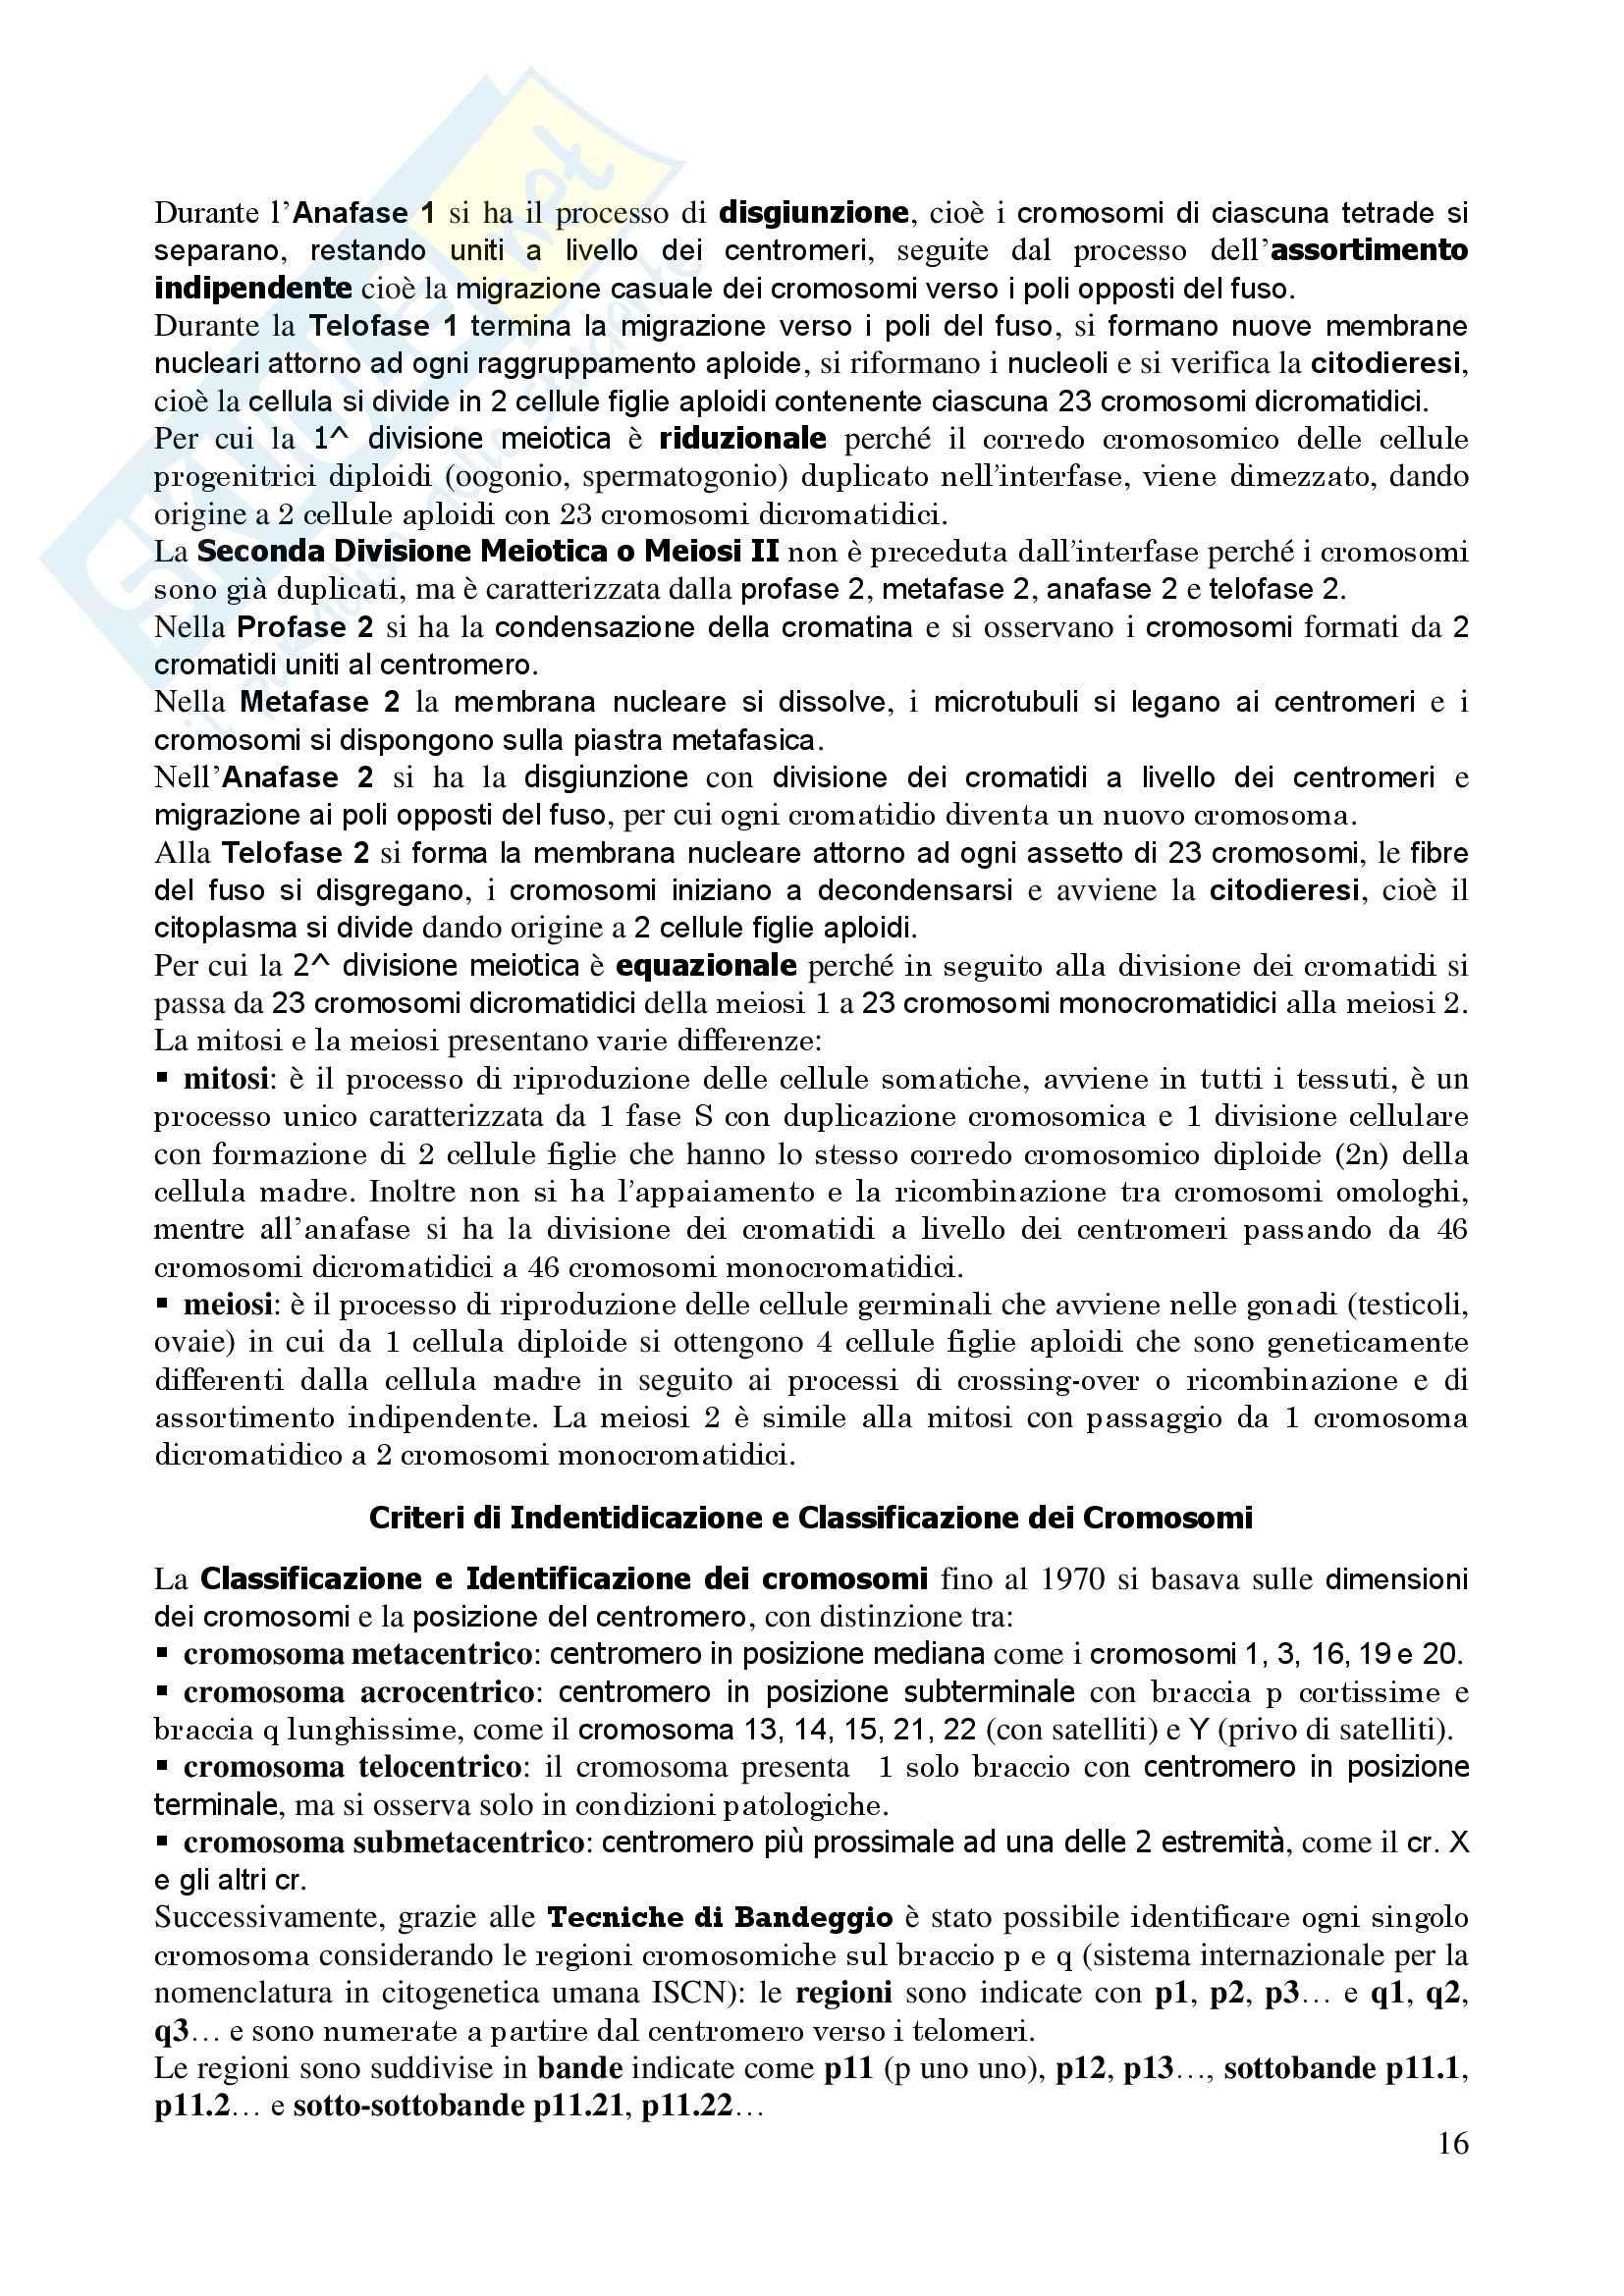 Genetica Umana - Appunti Pag. 16